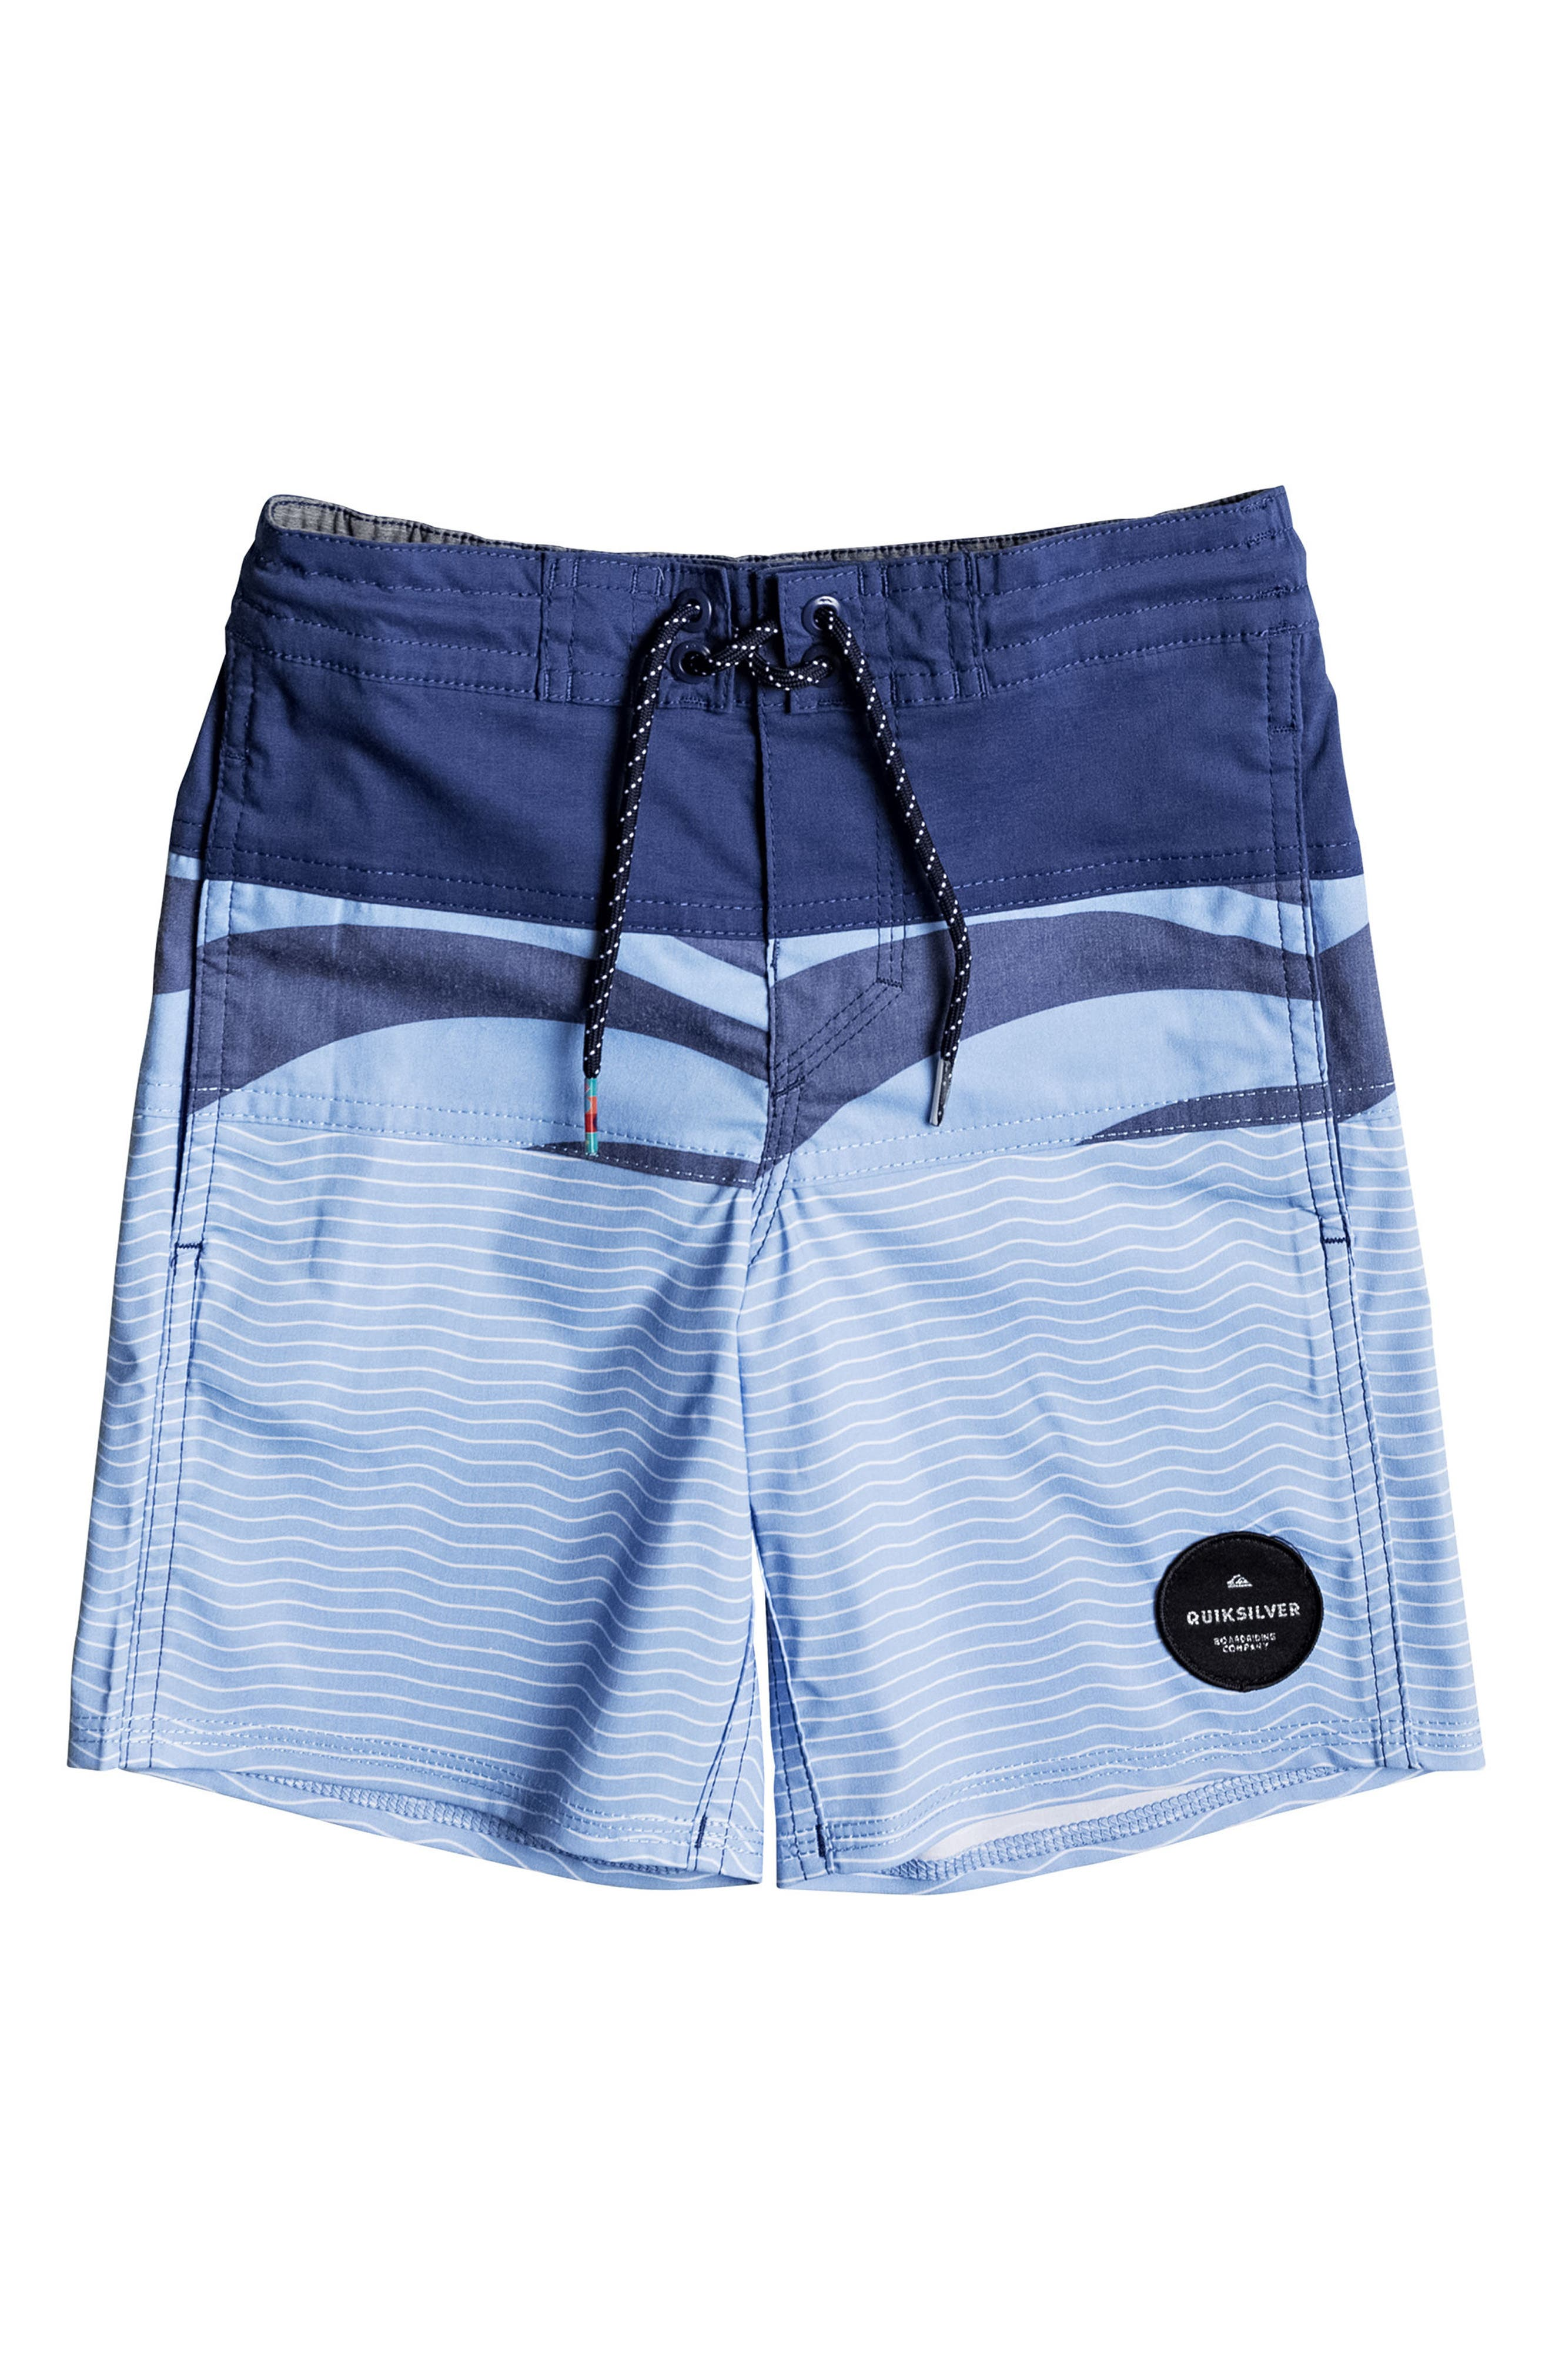 Quiksilver Heatwave Blocked Board Shorts (Toddler Boys & Little Boys)